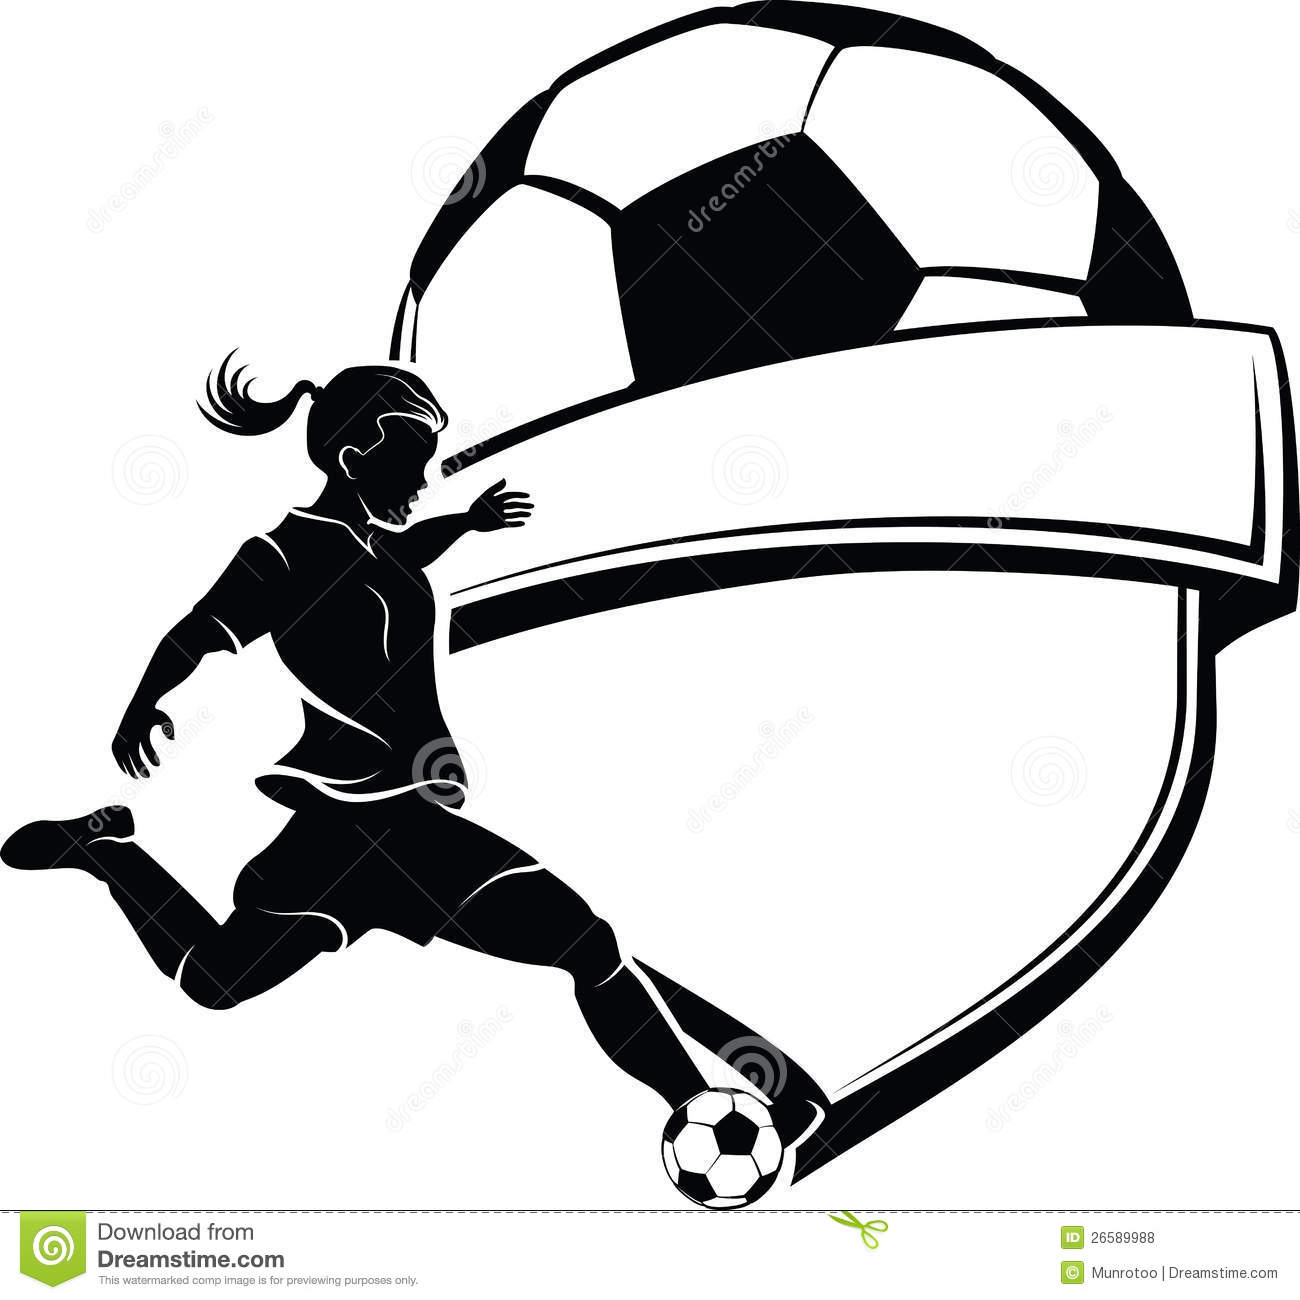 Kicking Soccer Ball Clipart - Clipart Kid